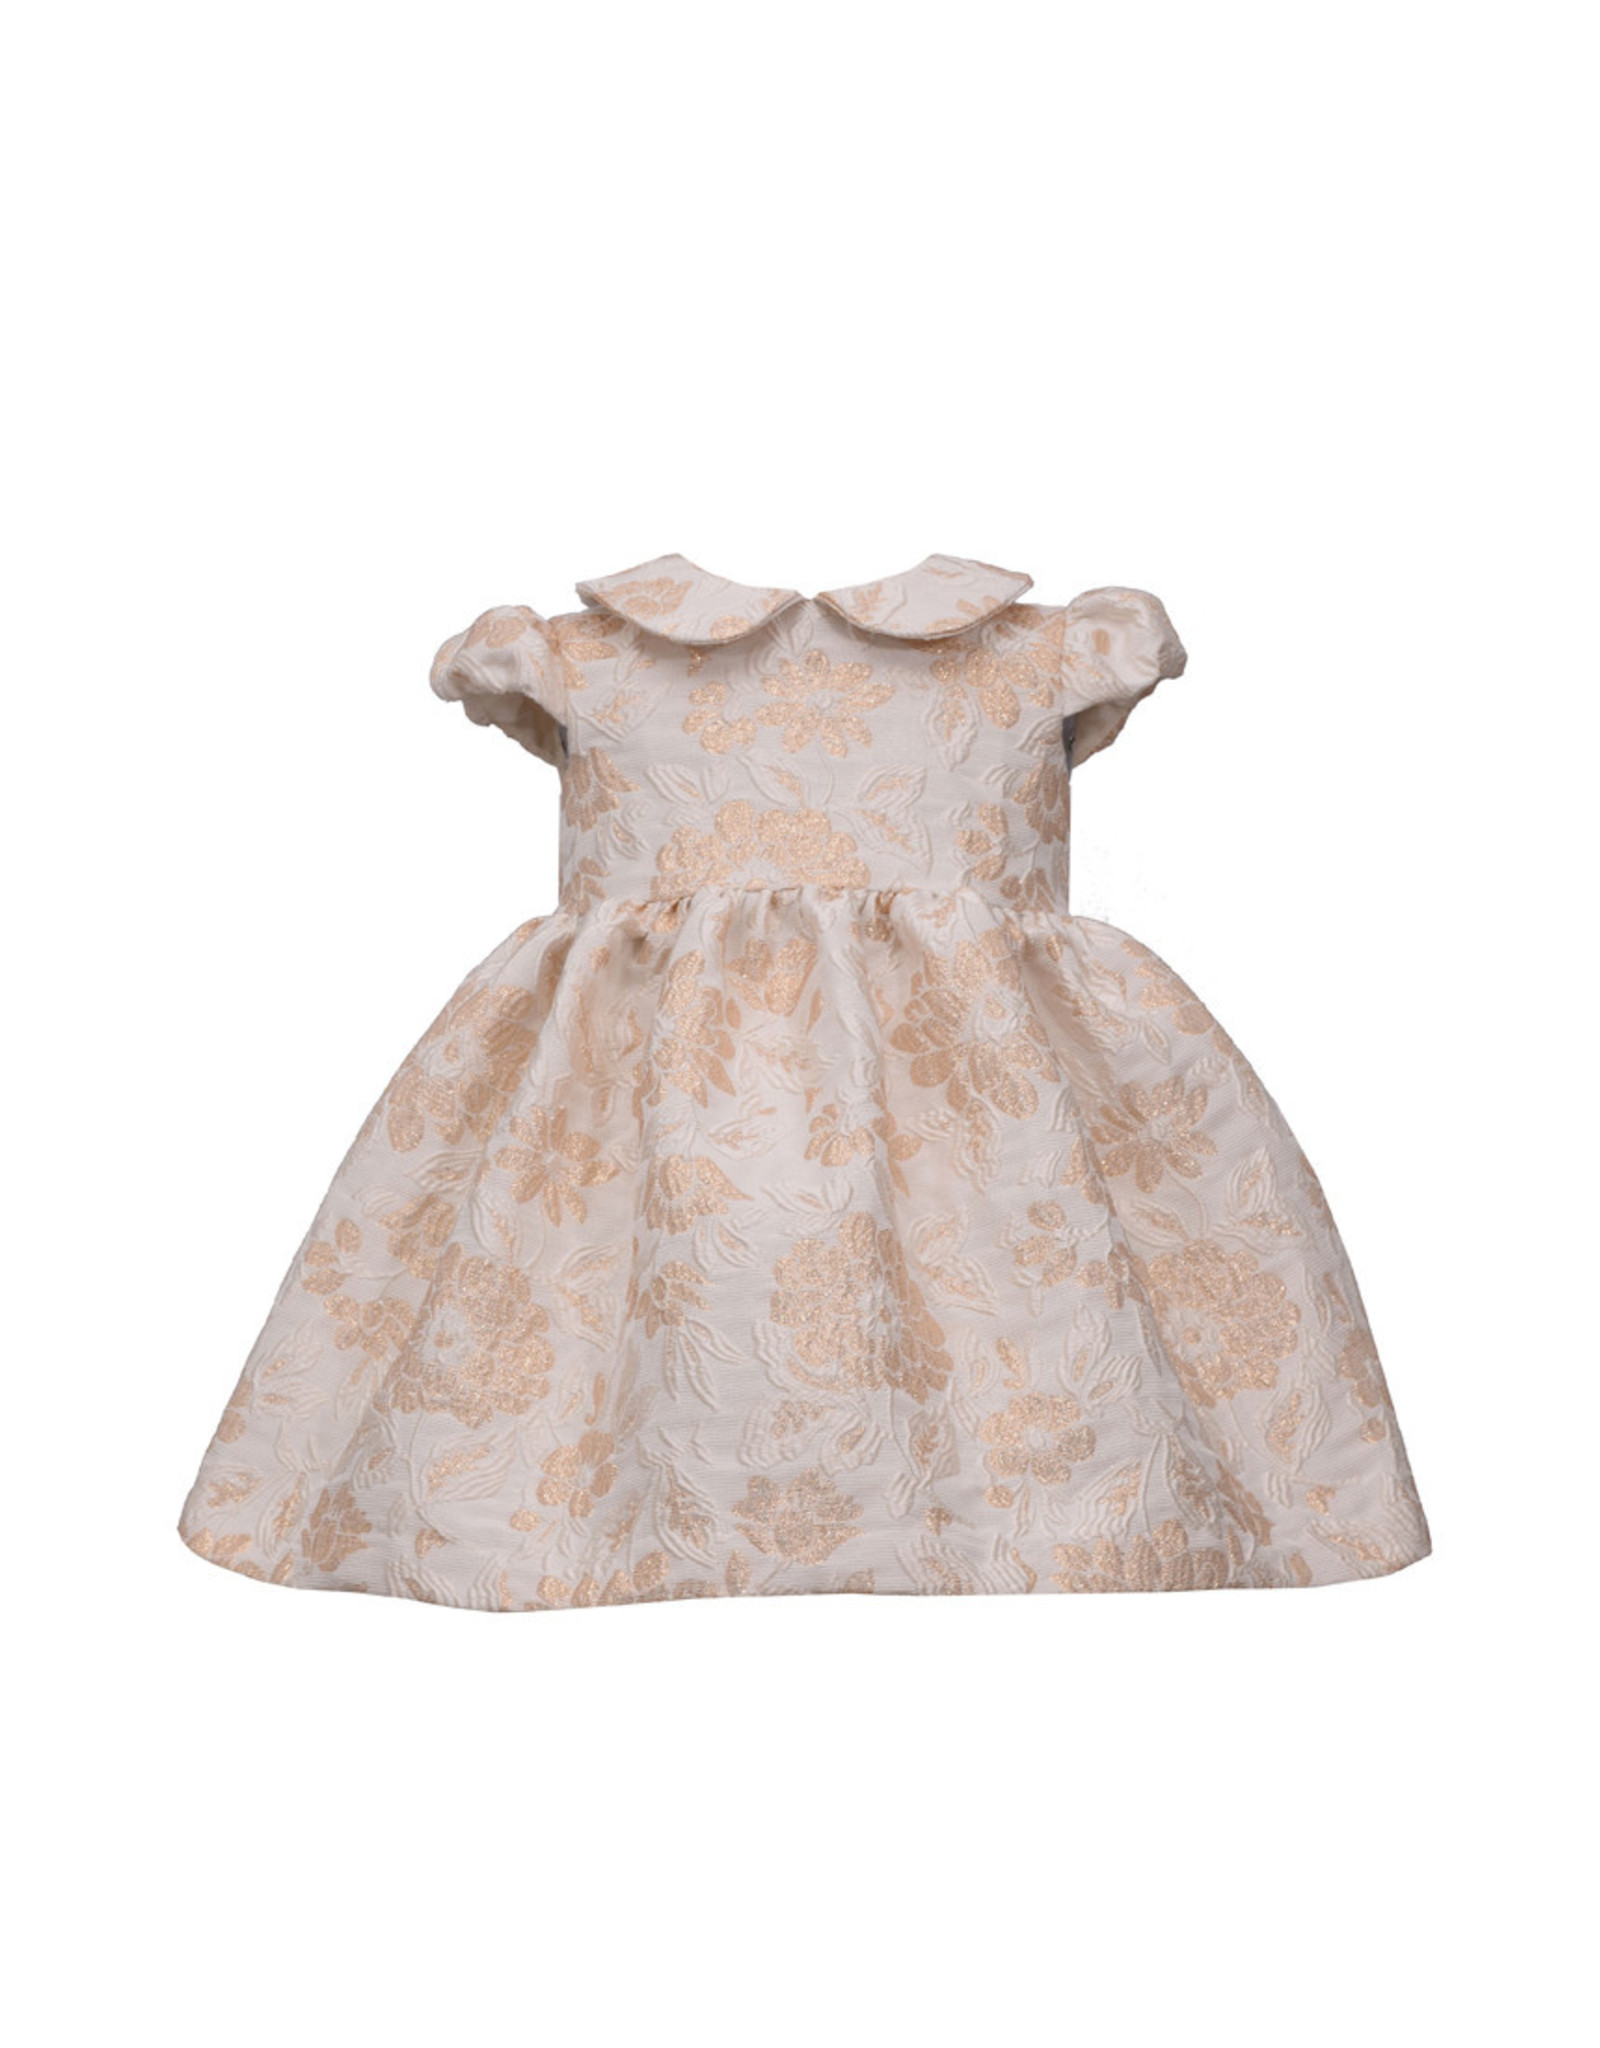 Bonnie  Jean Bonnie Jean- Gold Jaquard Empire Dress